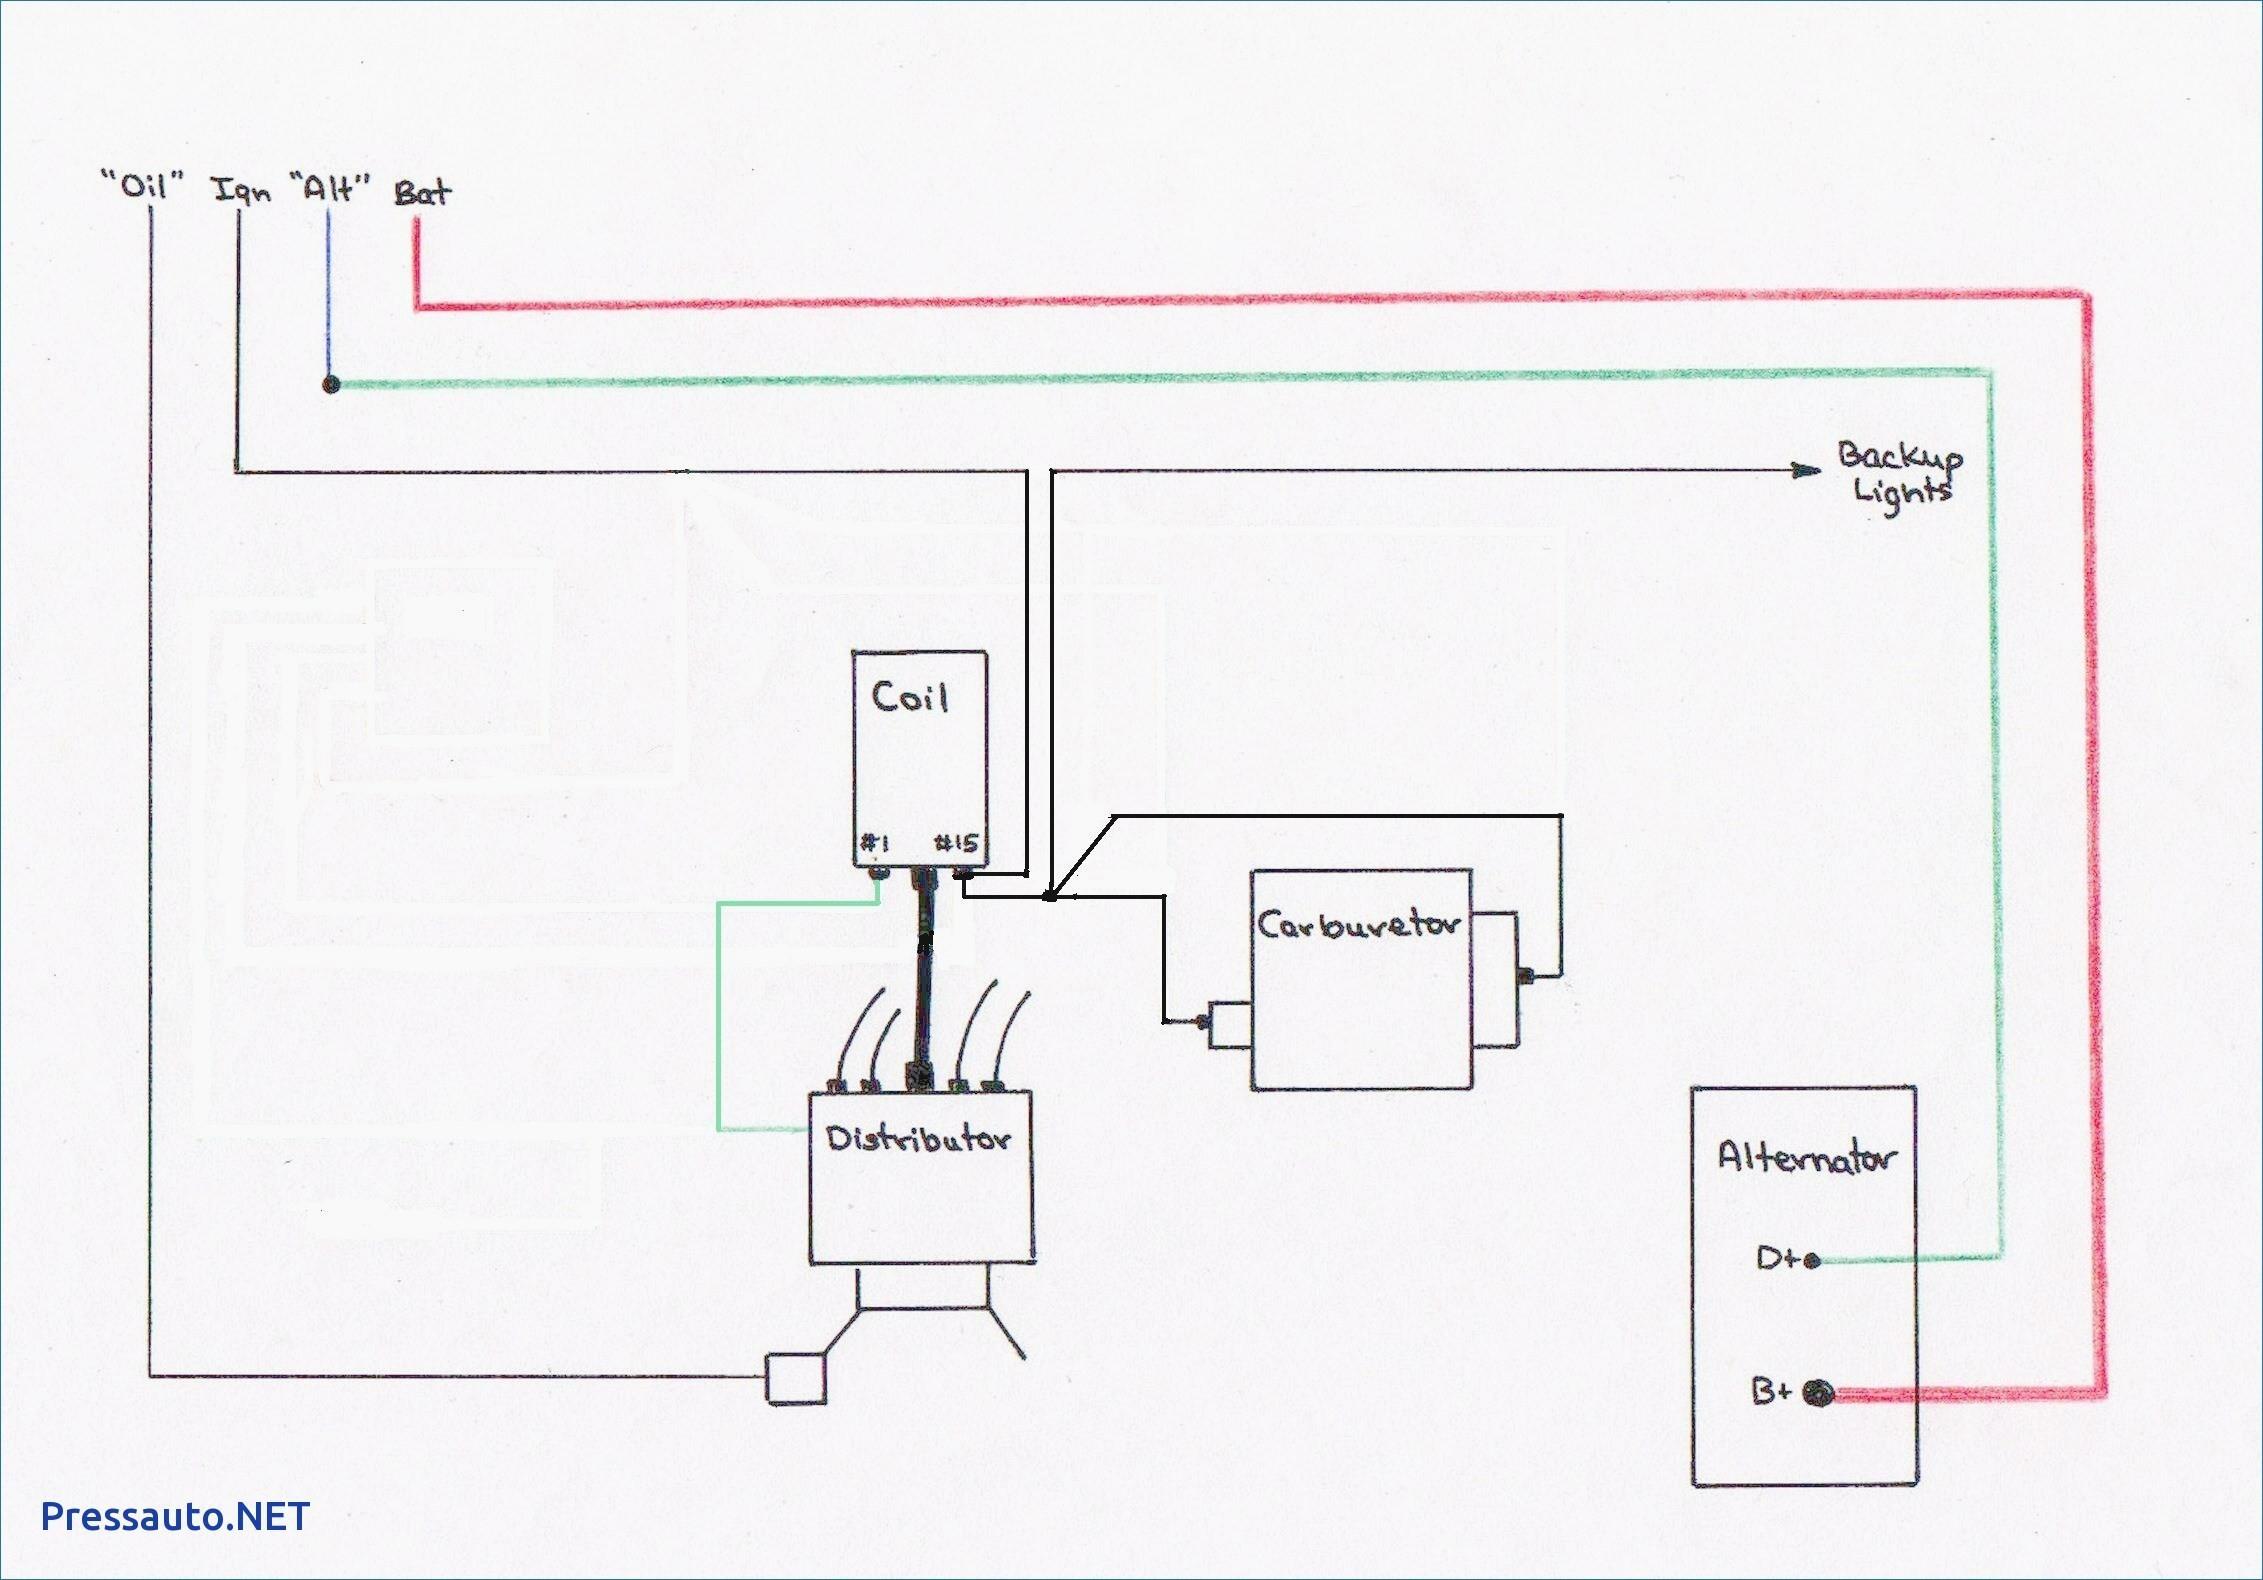 12 Volt Generator Voltage Regulator Wiring Diagram List Of 12 Volt - 12 Volt Generator Voltage Regulator Wiring Diagram